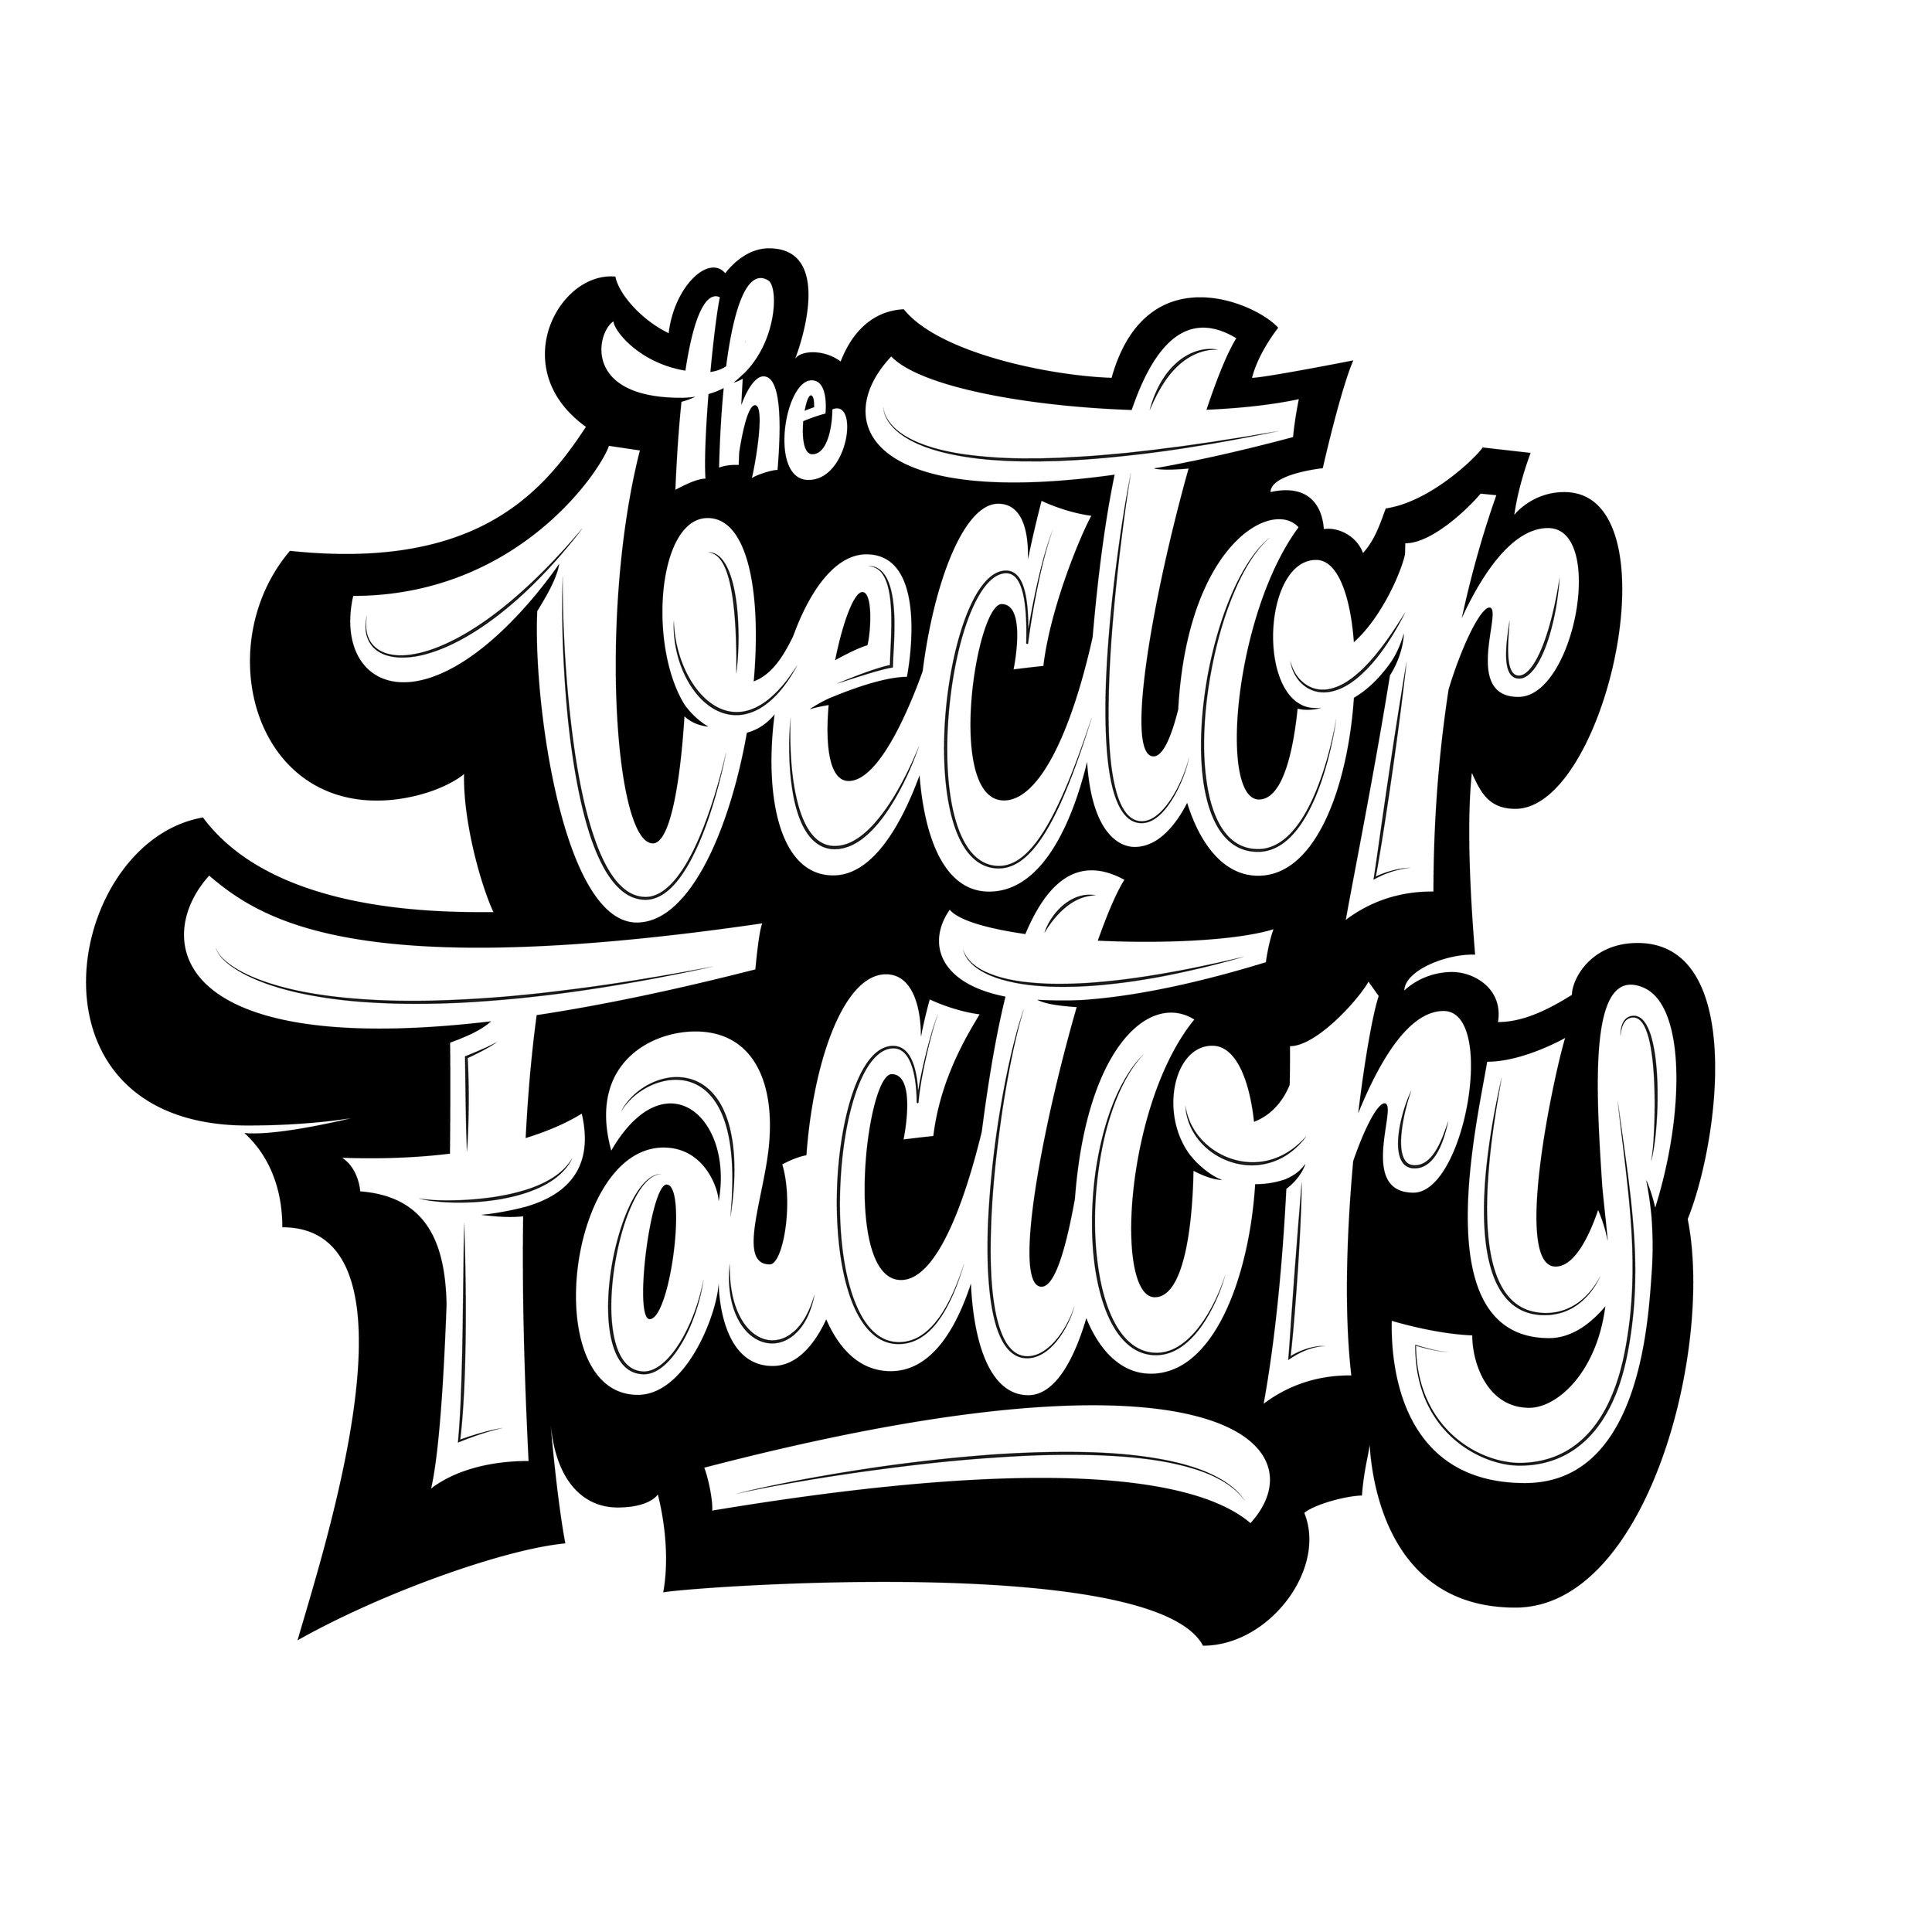 The-Vector-Factory-1.jpg